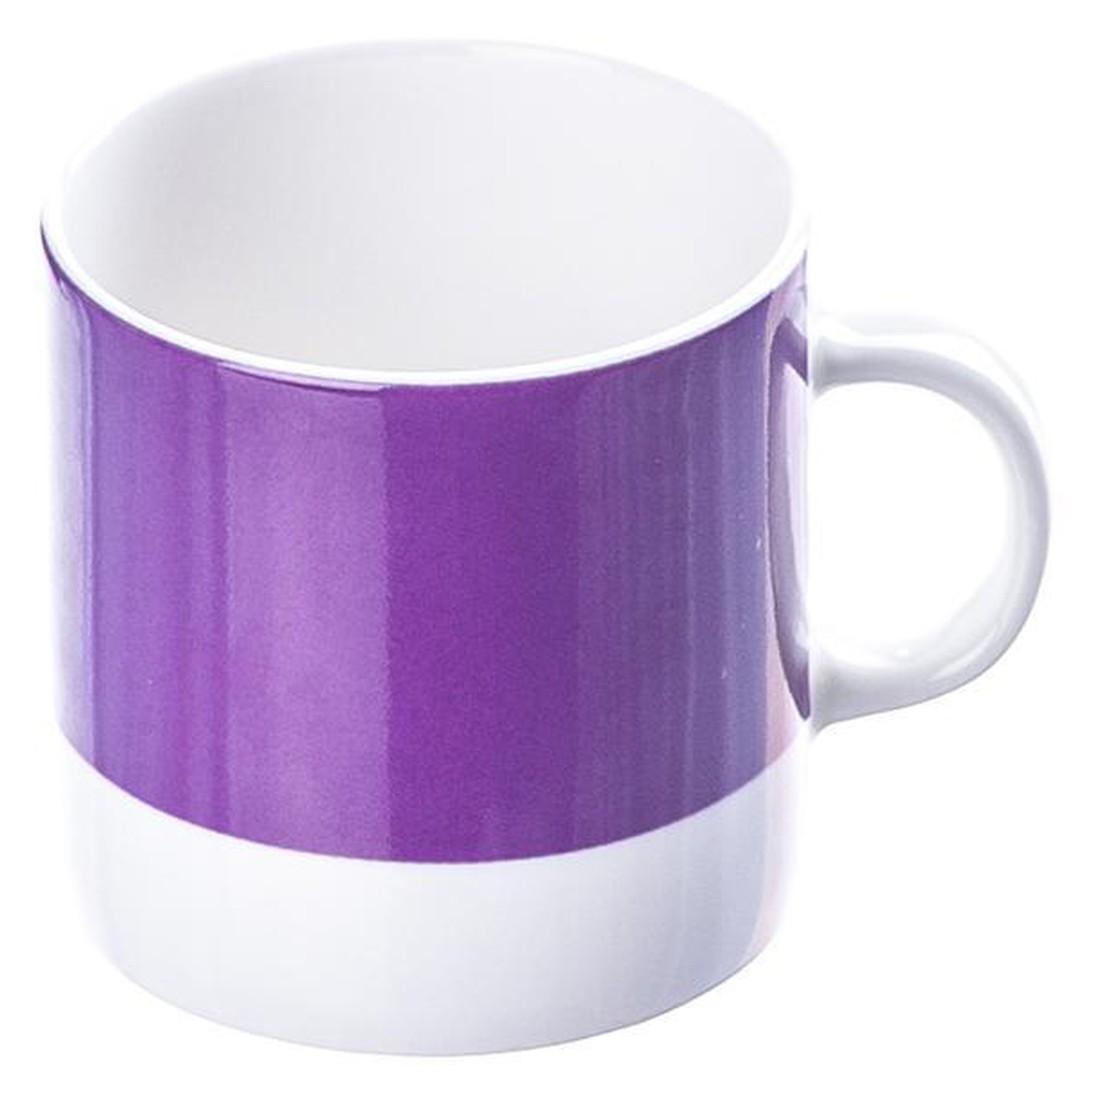 Espressotasse Grape Juice – Porzellan – Violett, Pantone günstig bestellen